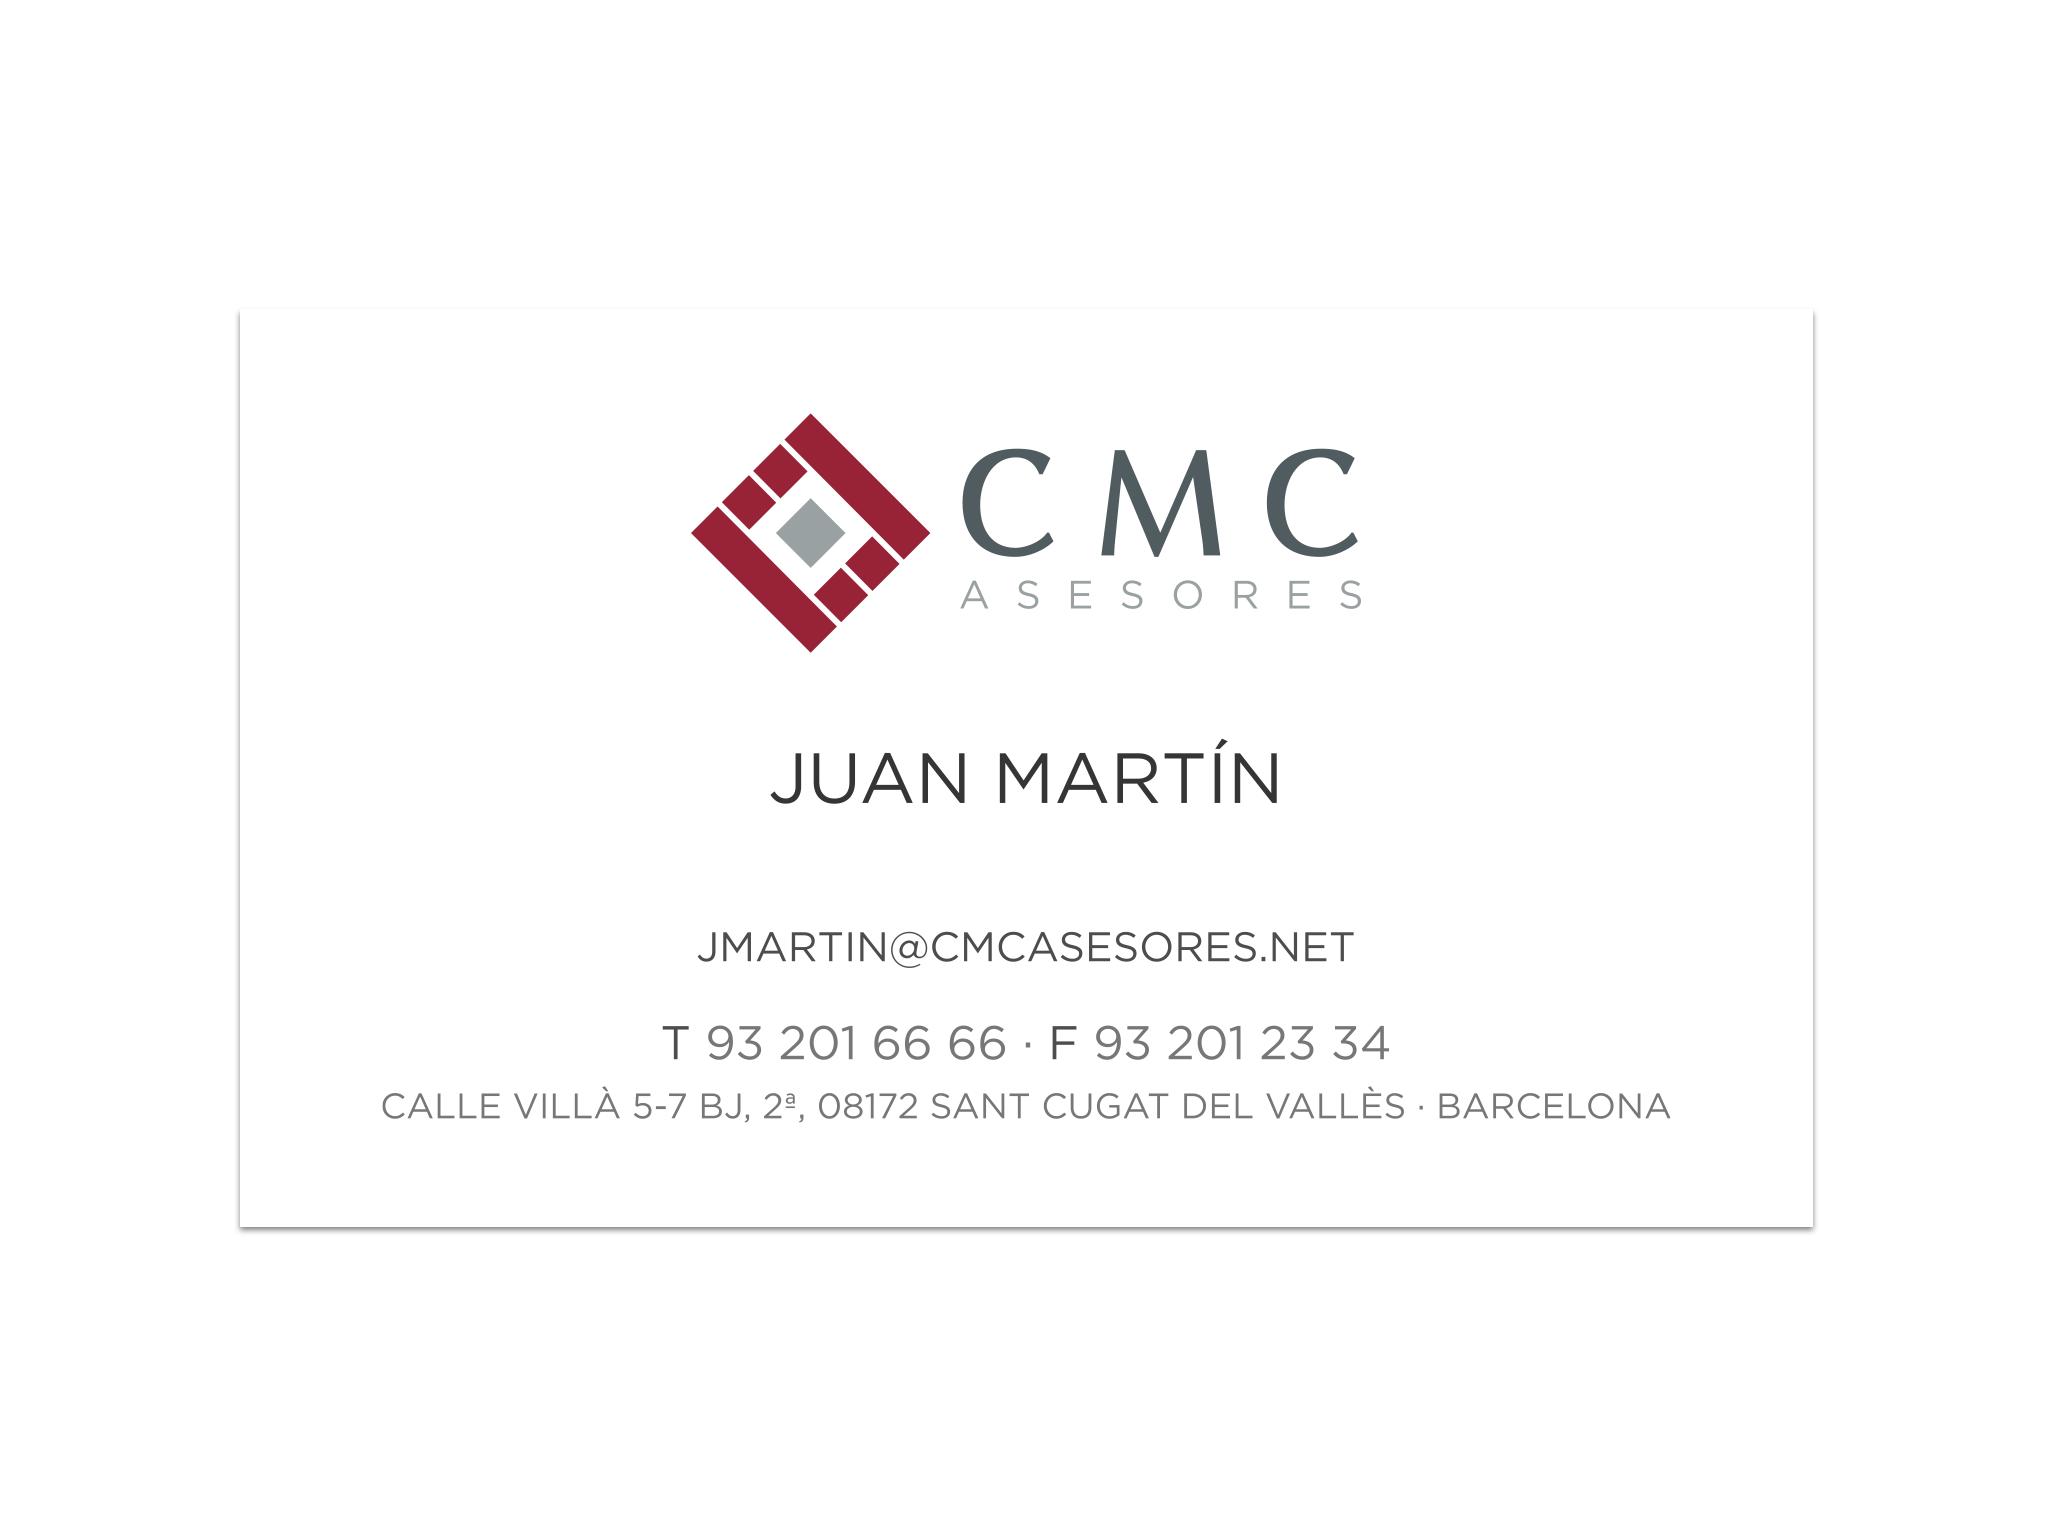 CMC tarjetas